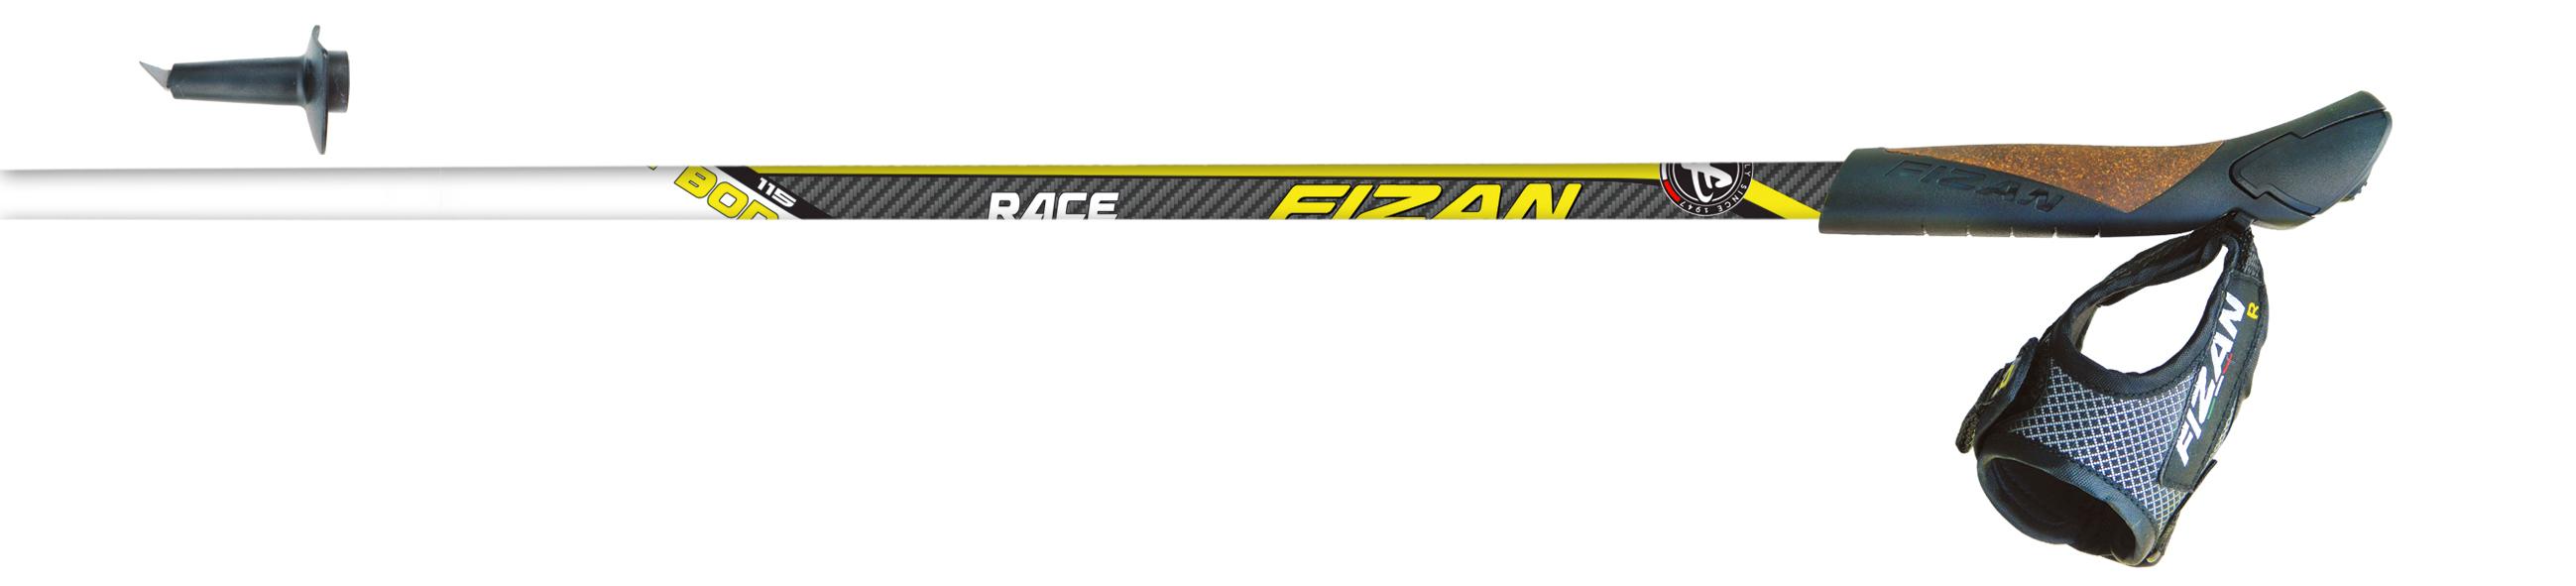 FIZAN NW PERFORMANCE RACE - 100cm